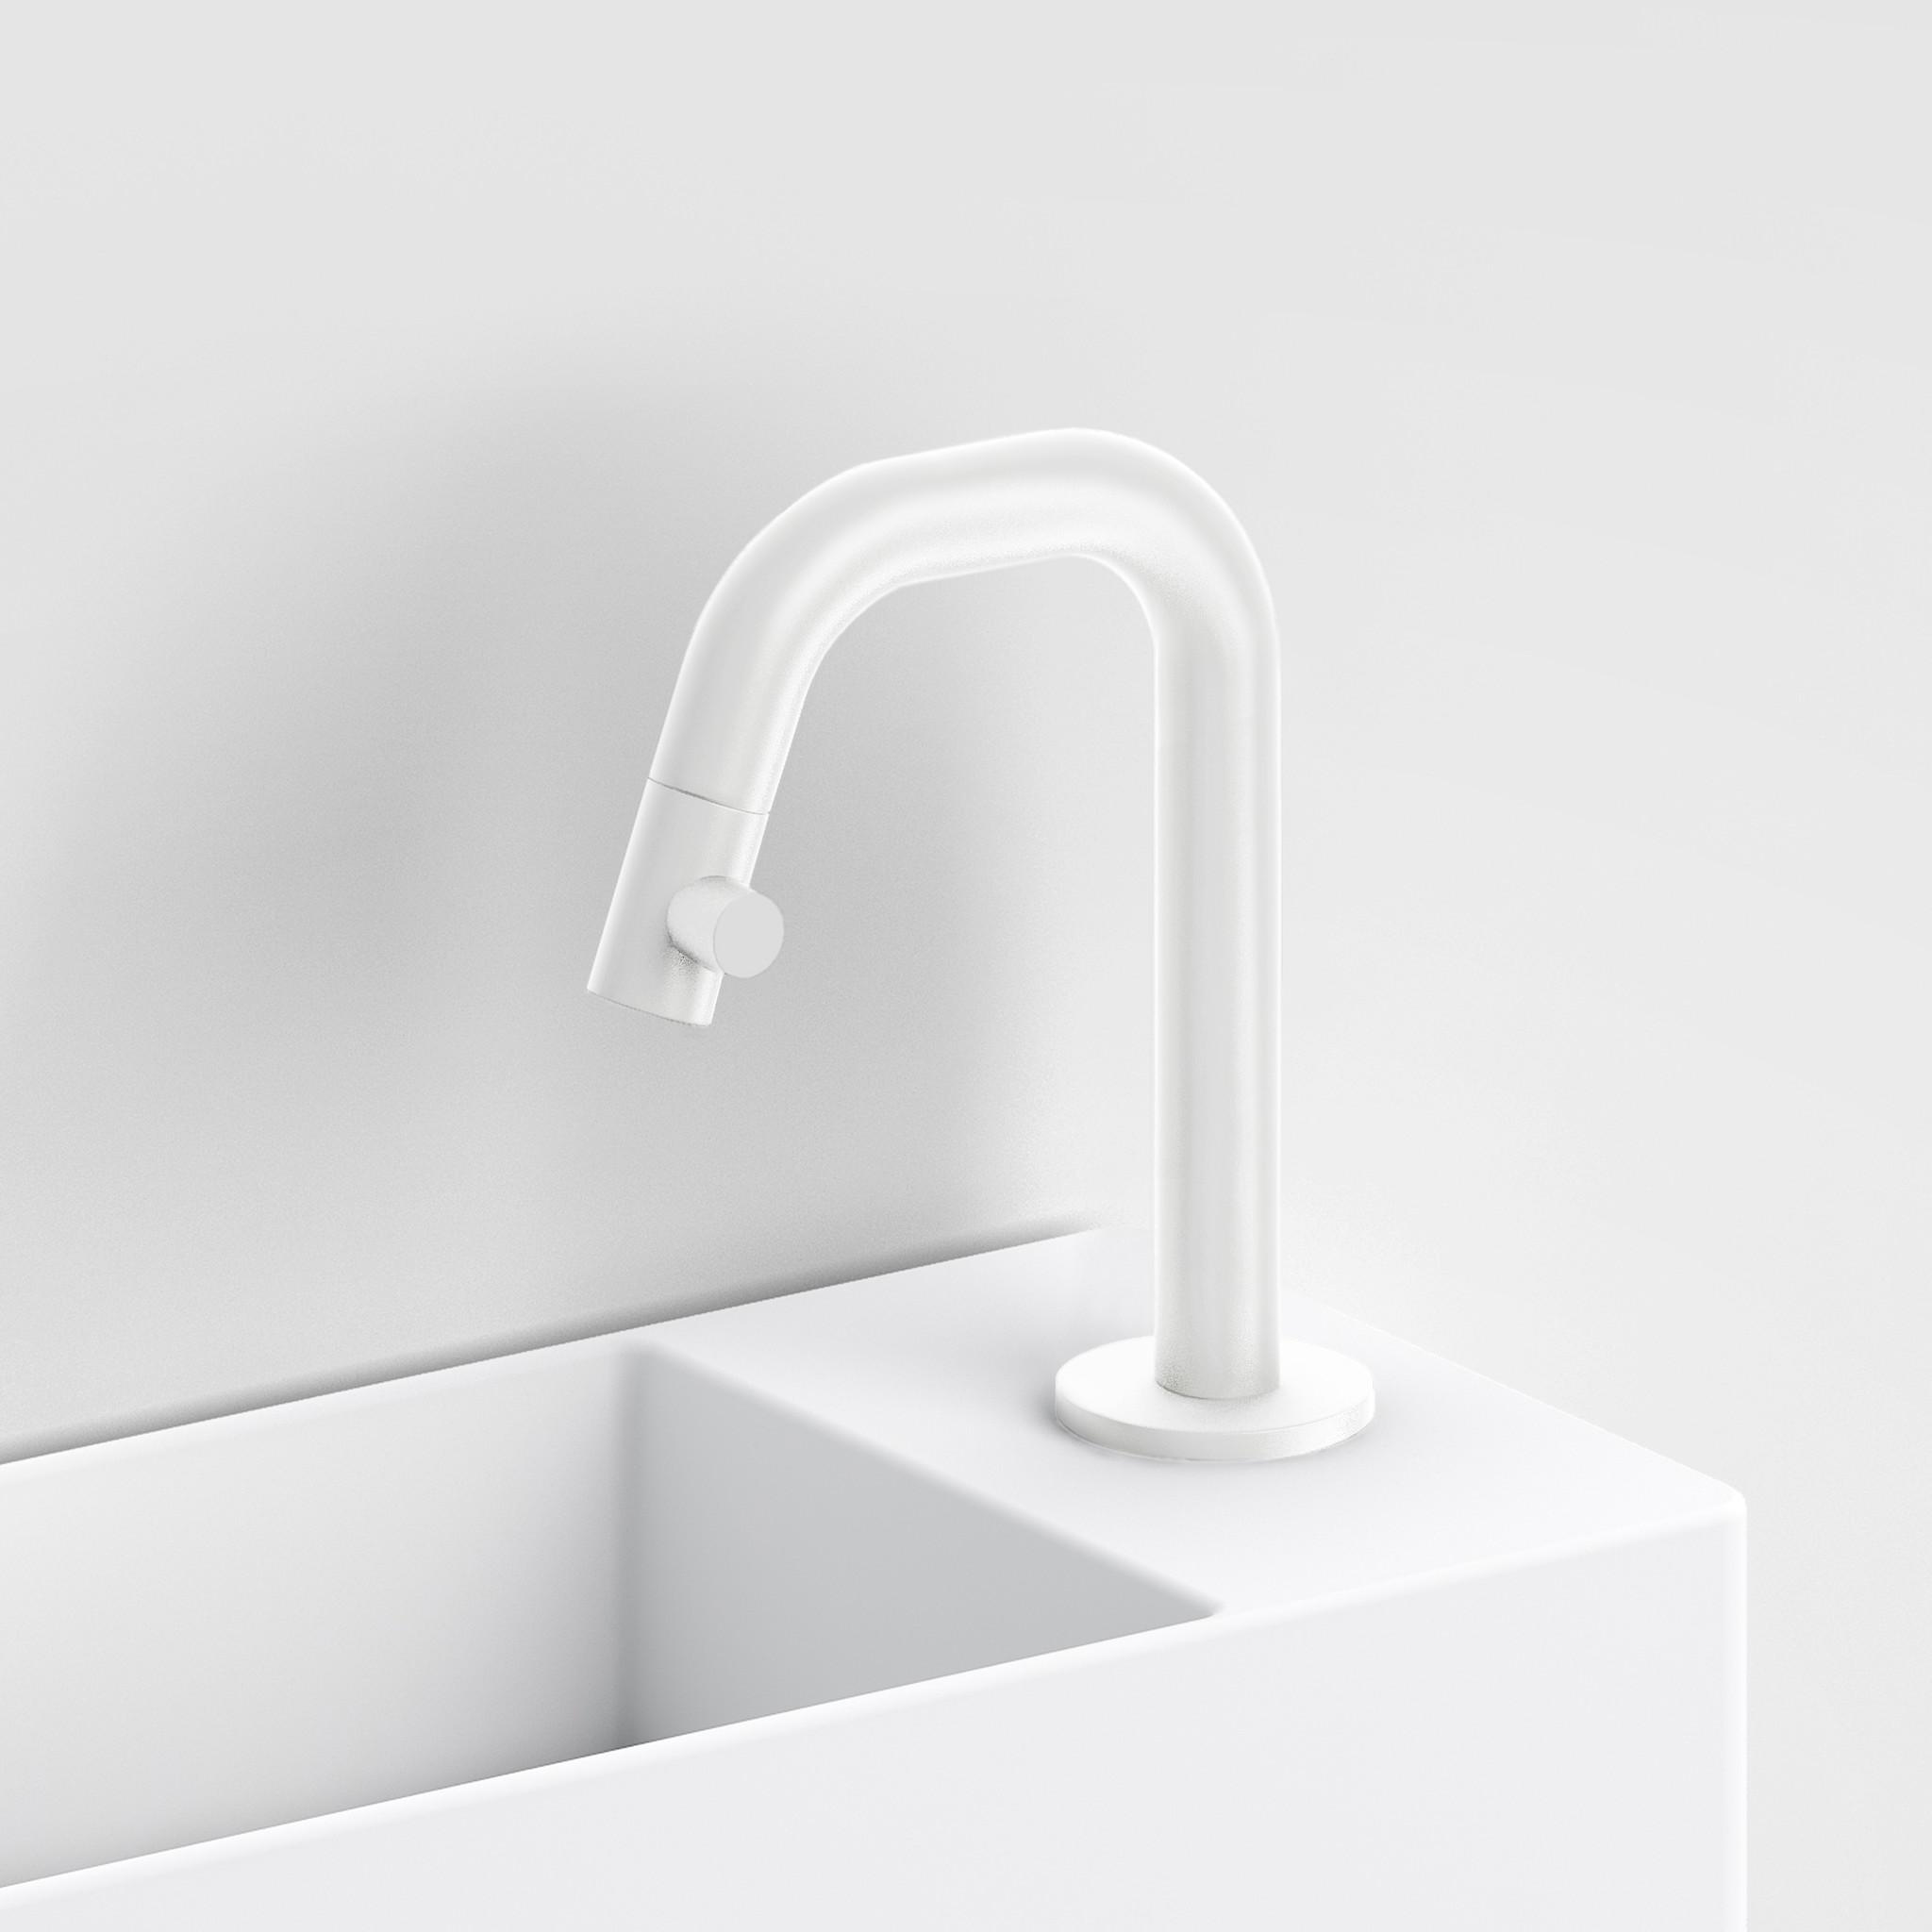 Kaldur robinet eau froide blanc